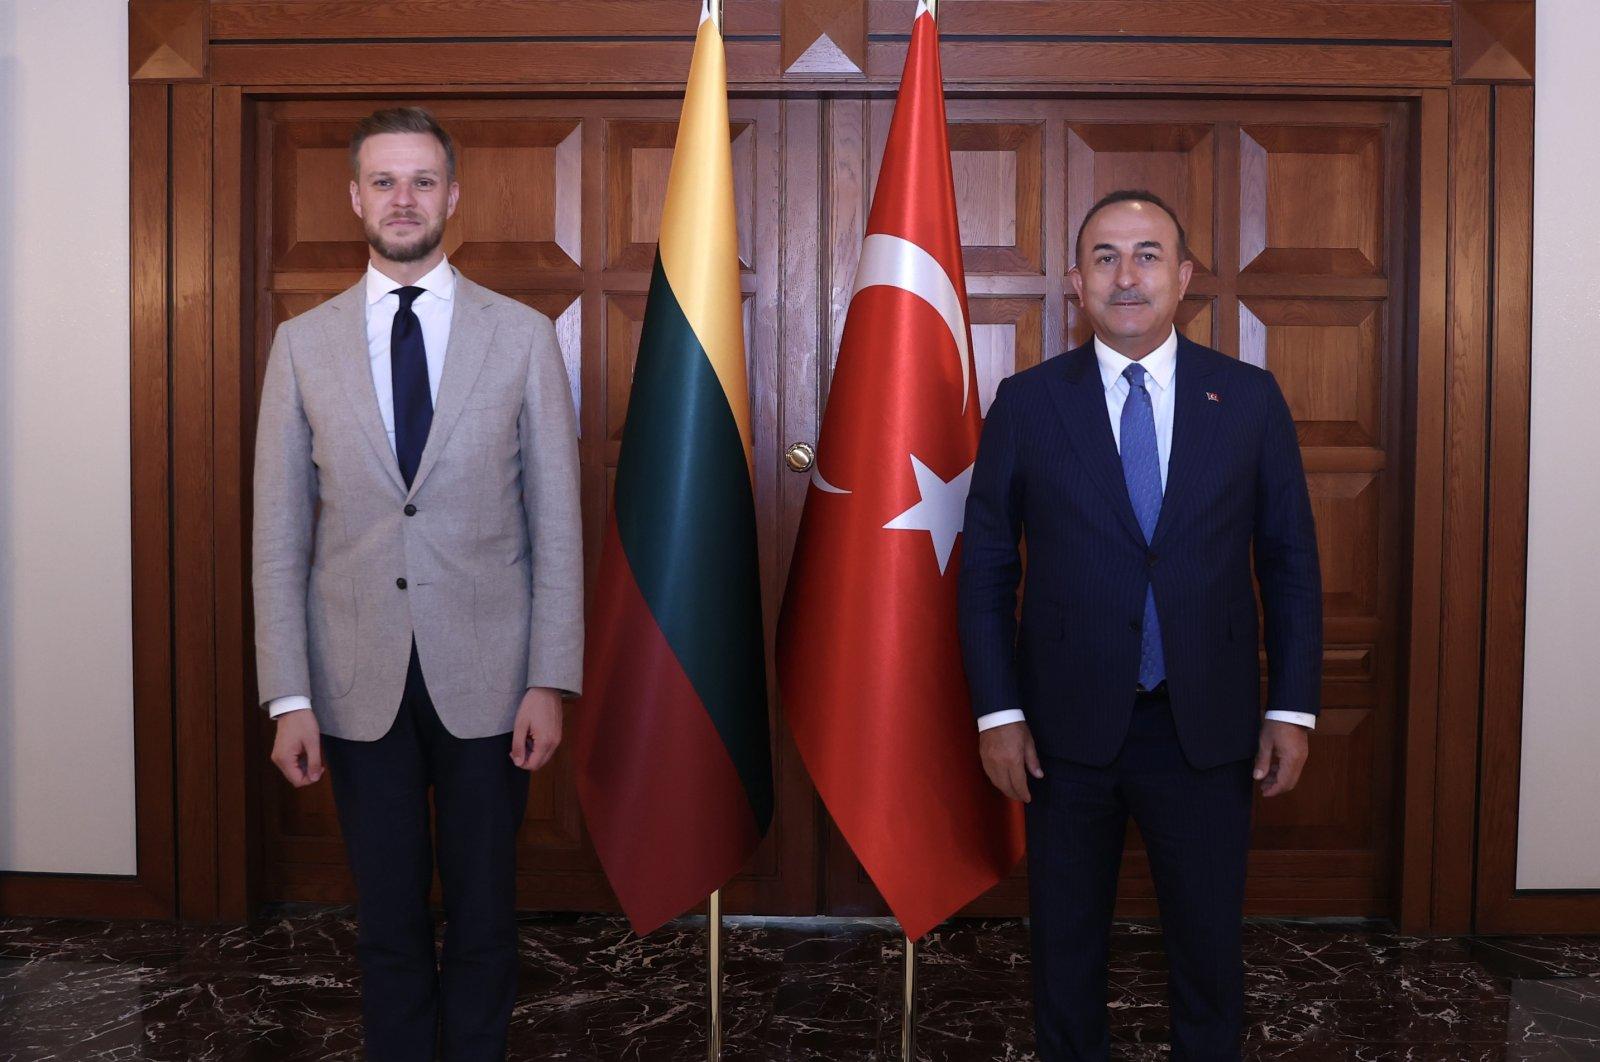 Foreign Minister Mevlüt Çavuşoğlu (R) welcomes his Lithuanian counterpart Gabrielius Landsbergis in Ankara, Turkey, July 13, 2021. (AA Photo)